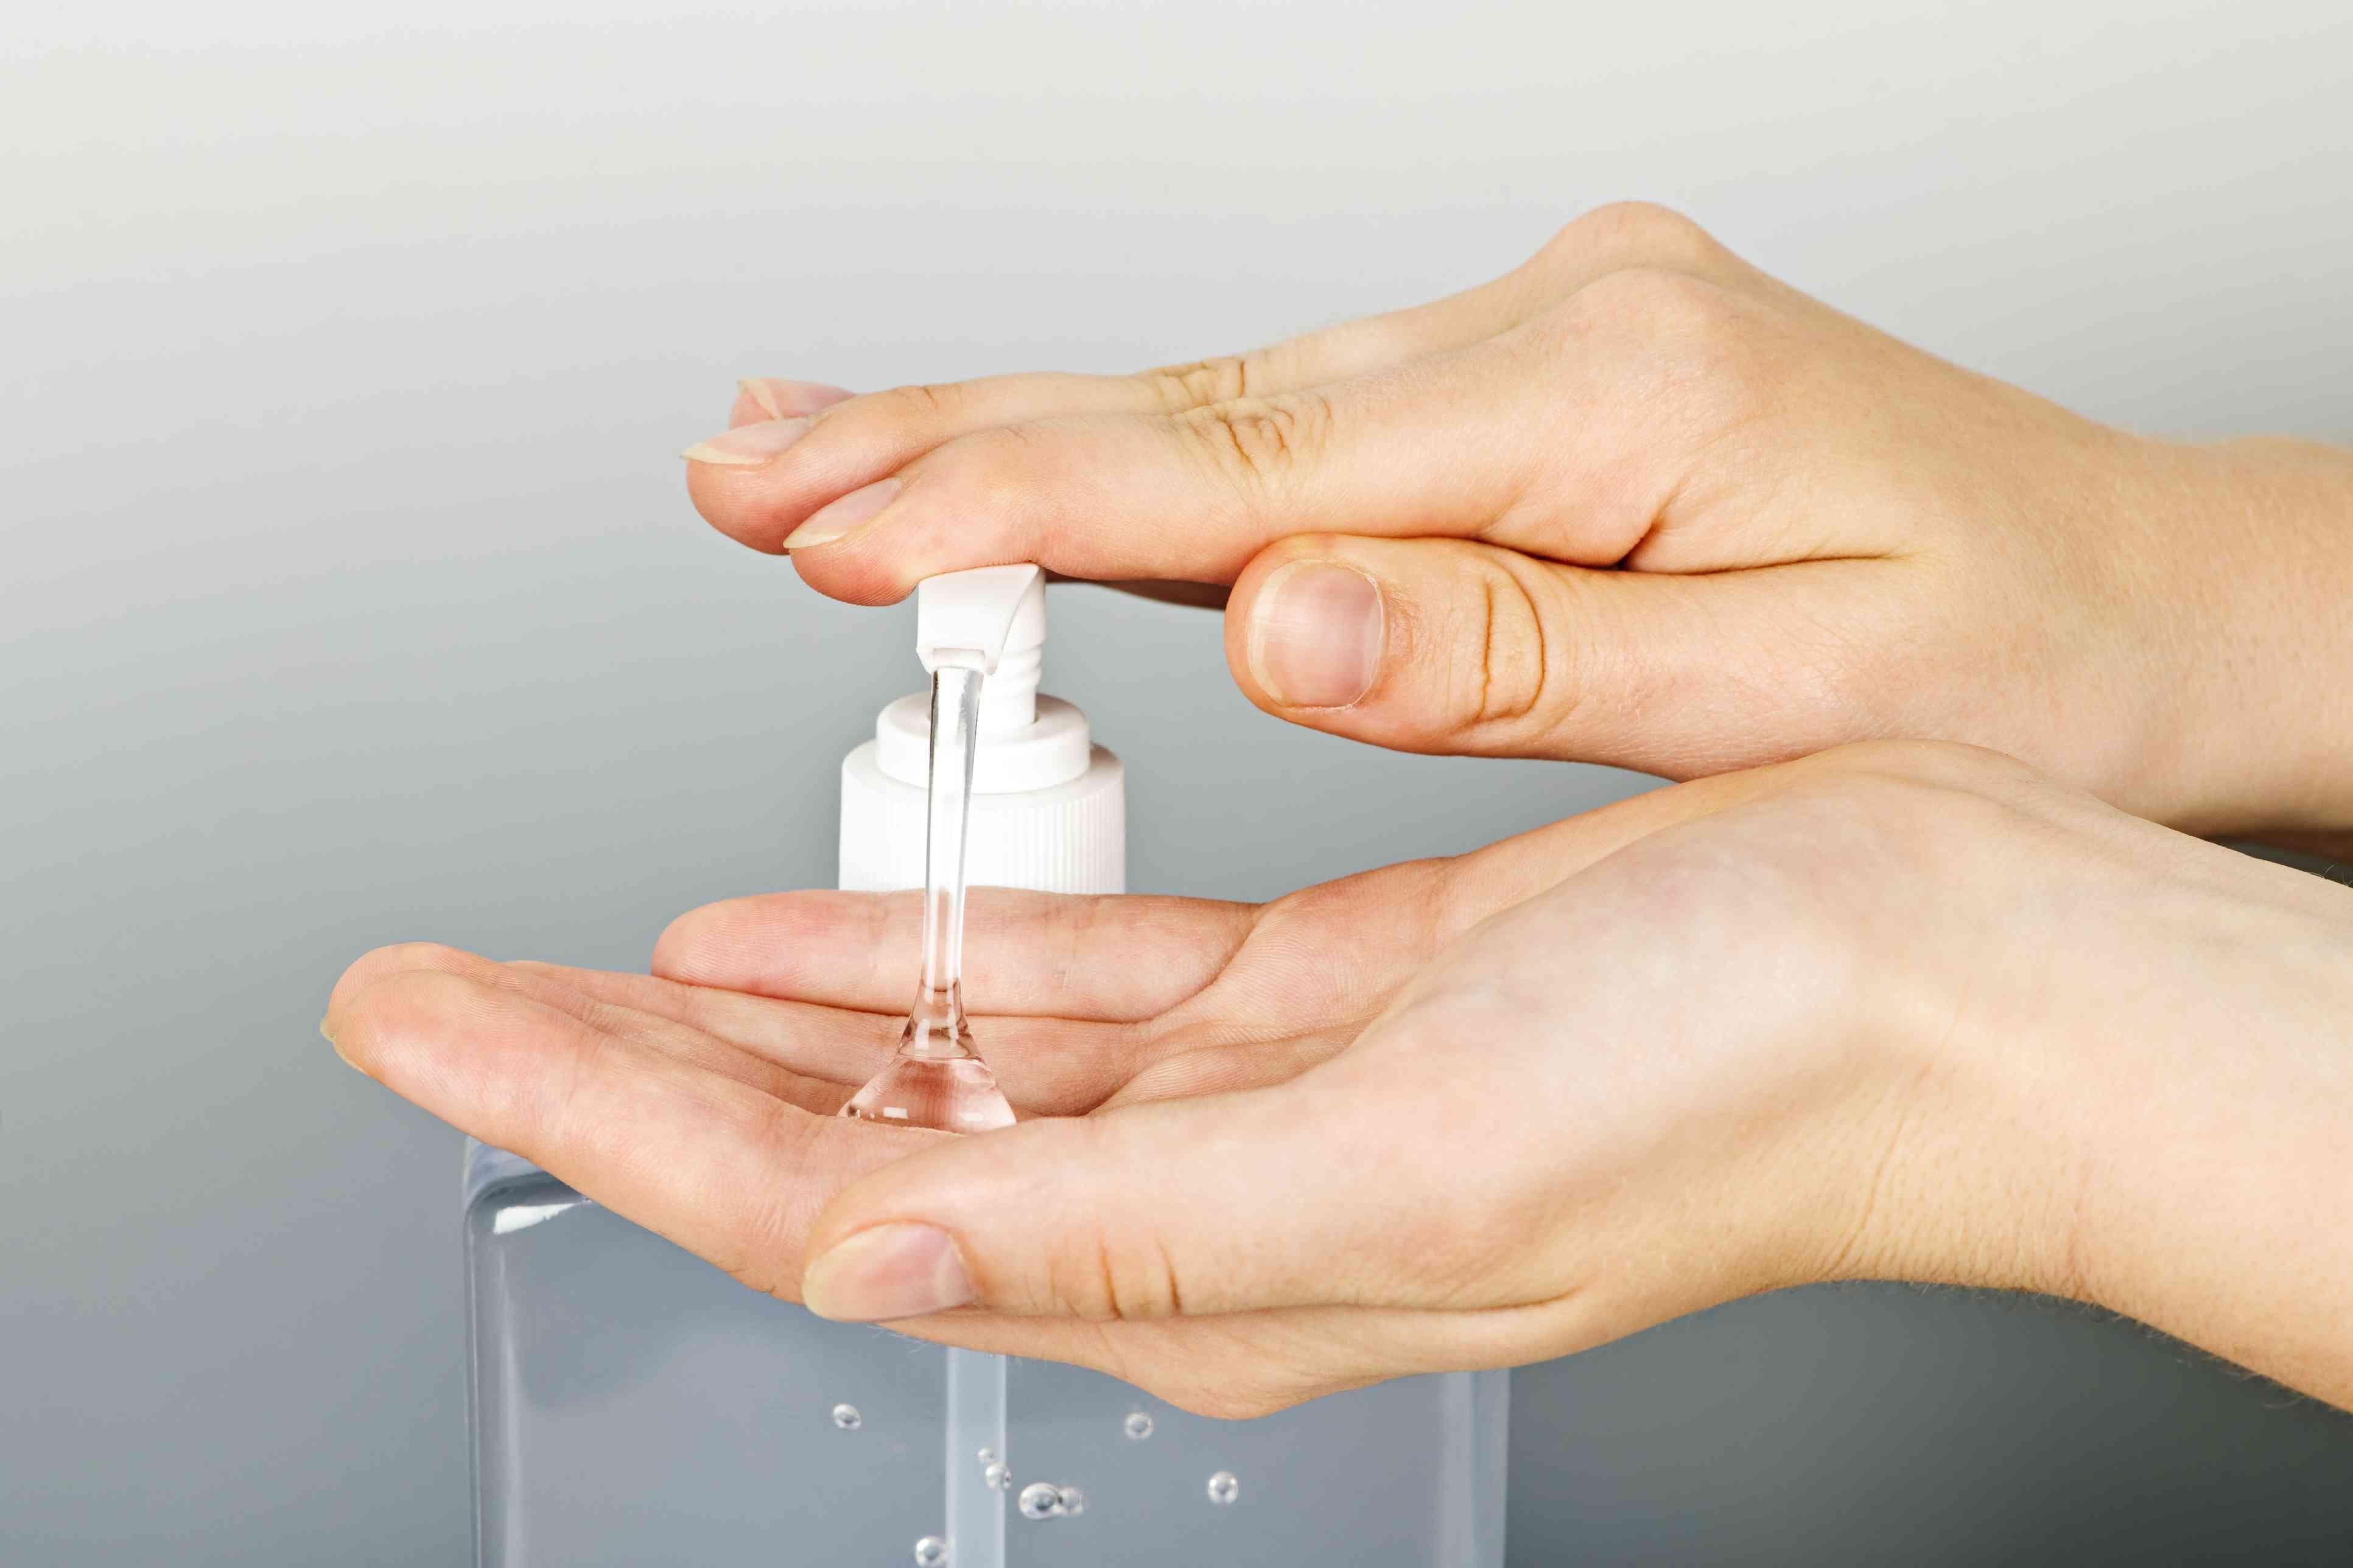 Hands applying germ sanitizer gel